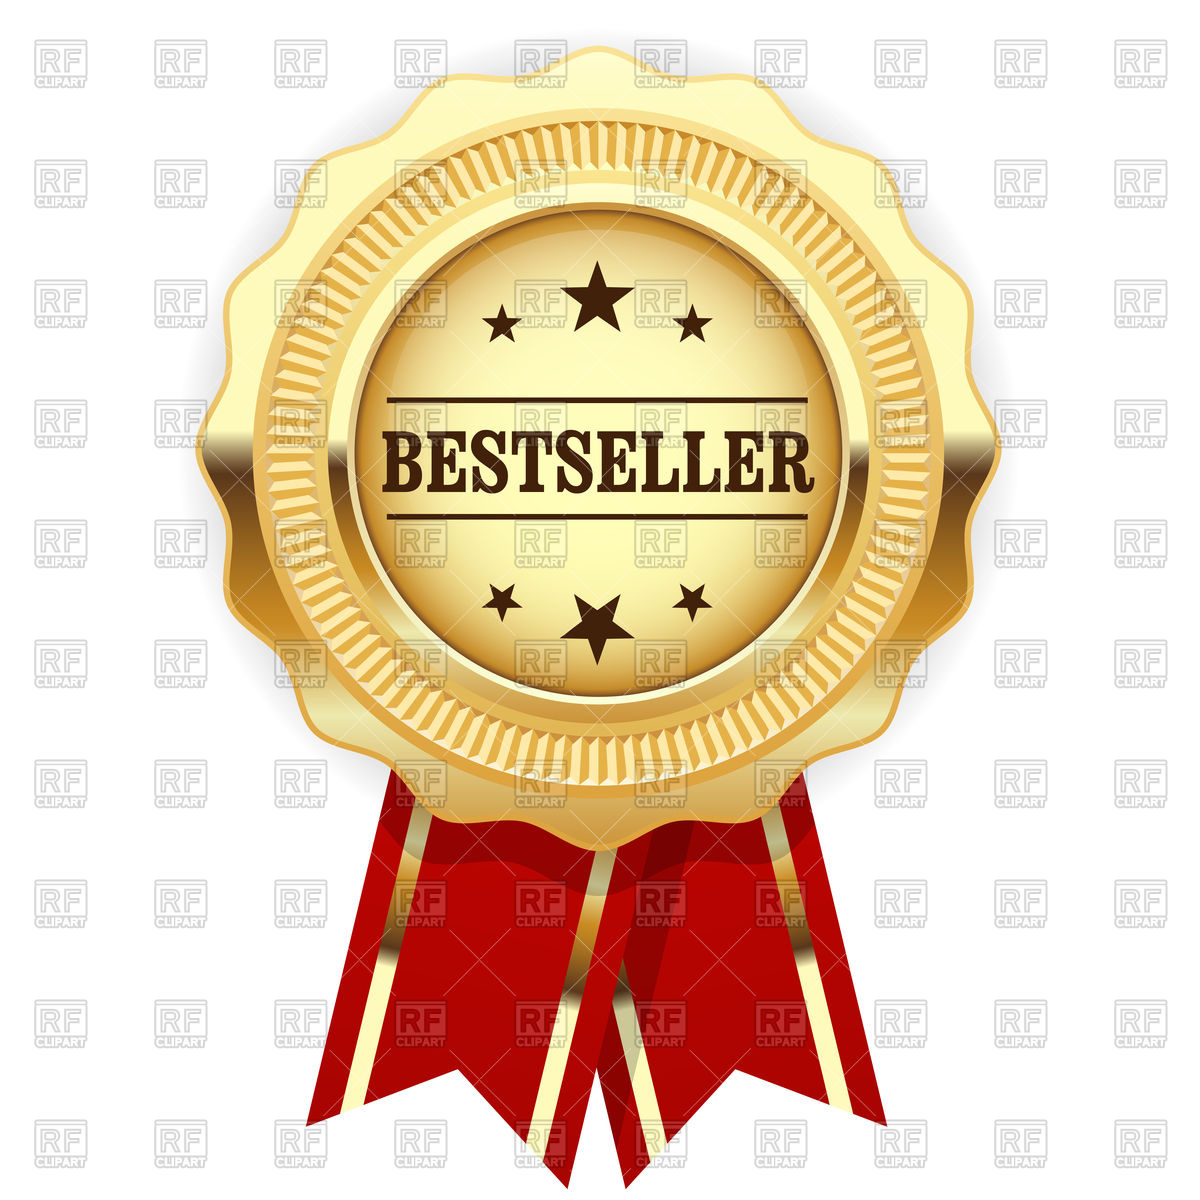 Golden medal bestseller with red ribbon Vector Image #124252.